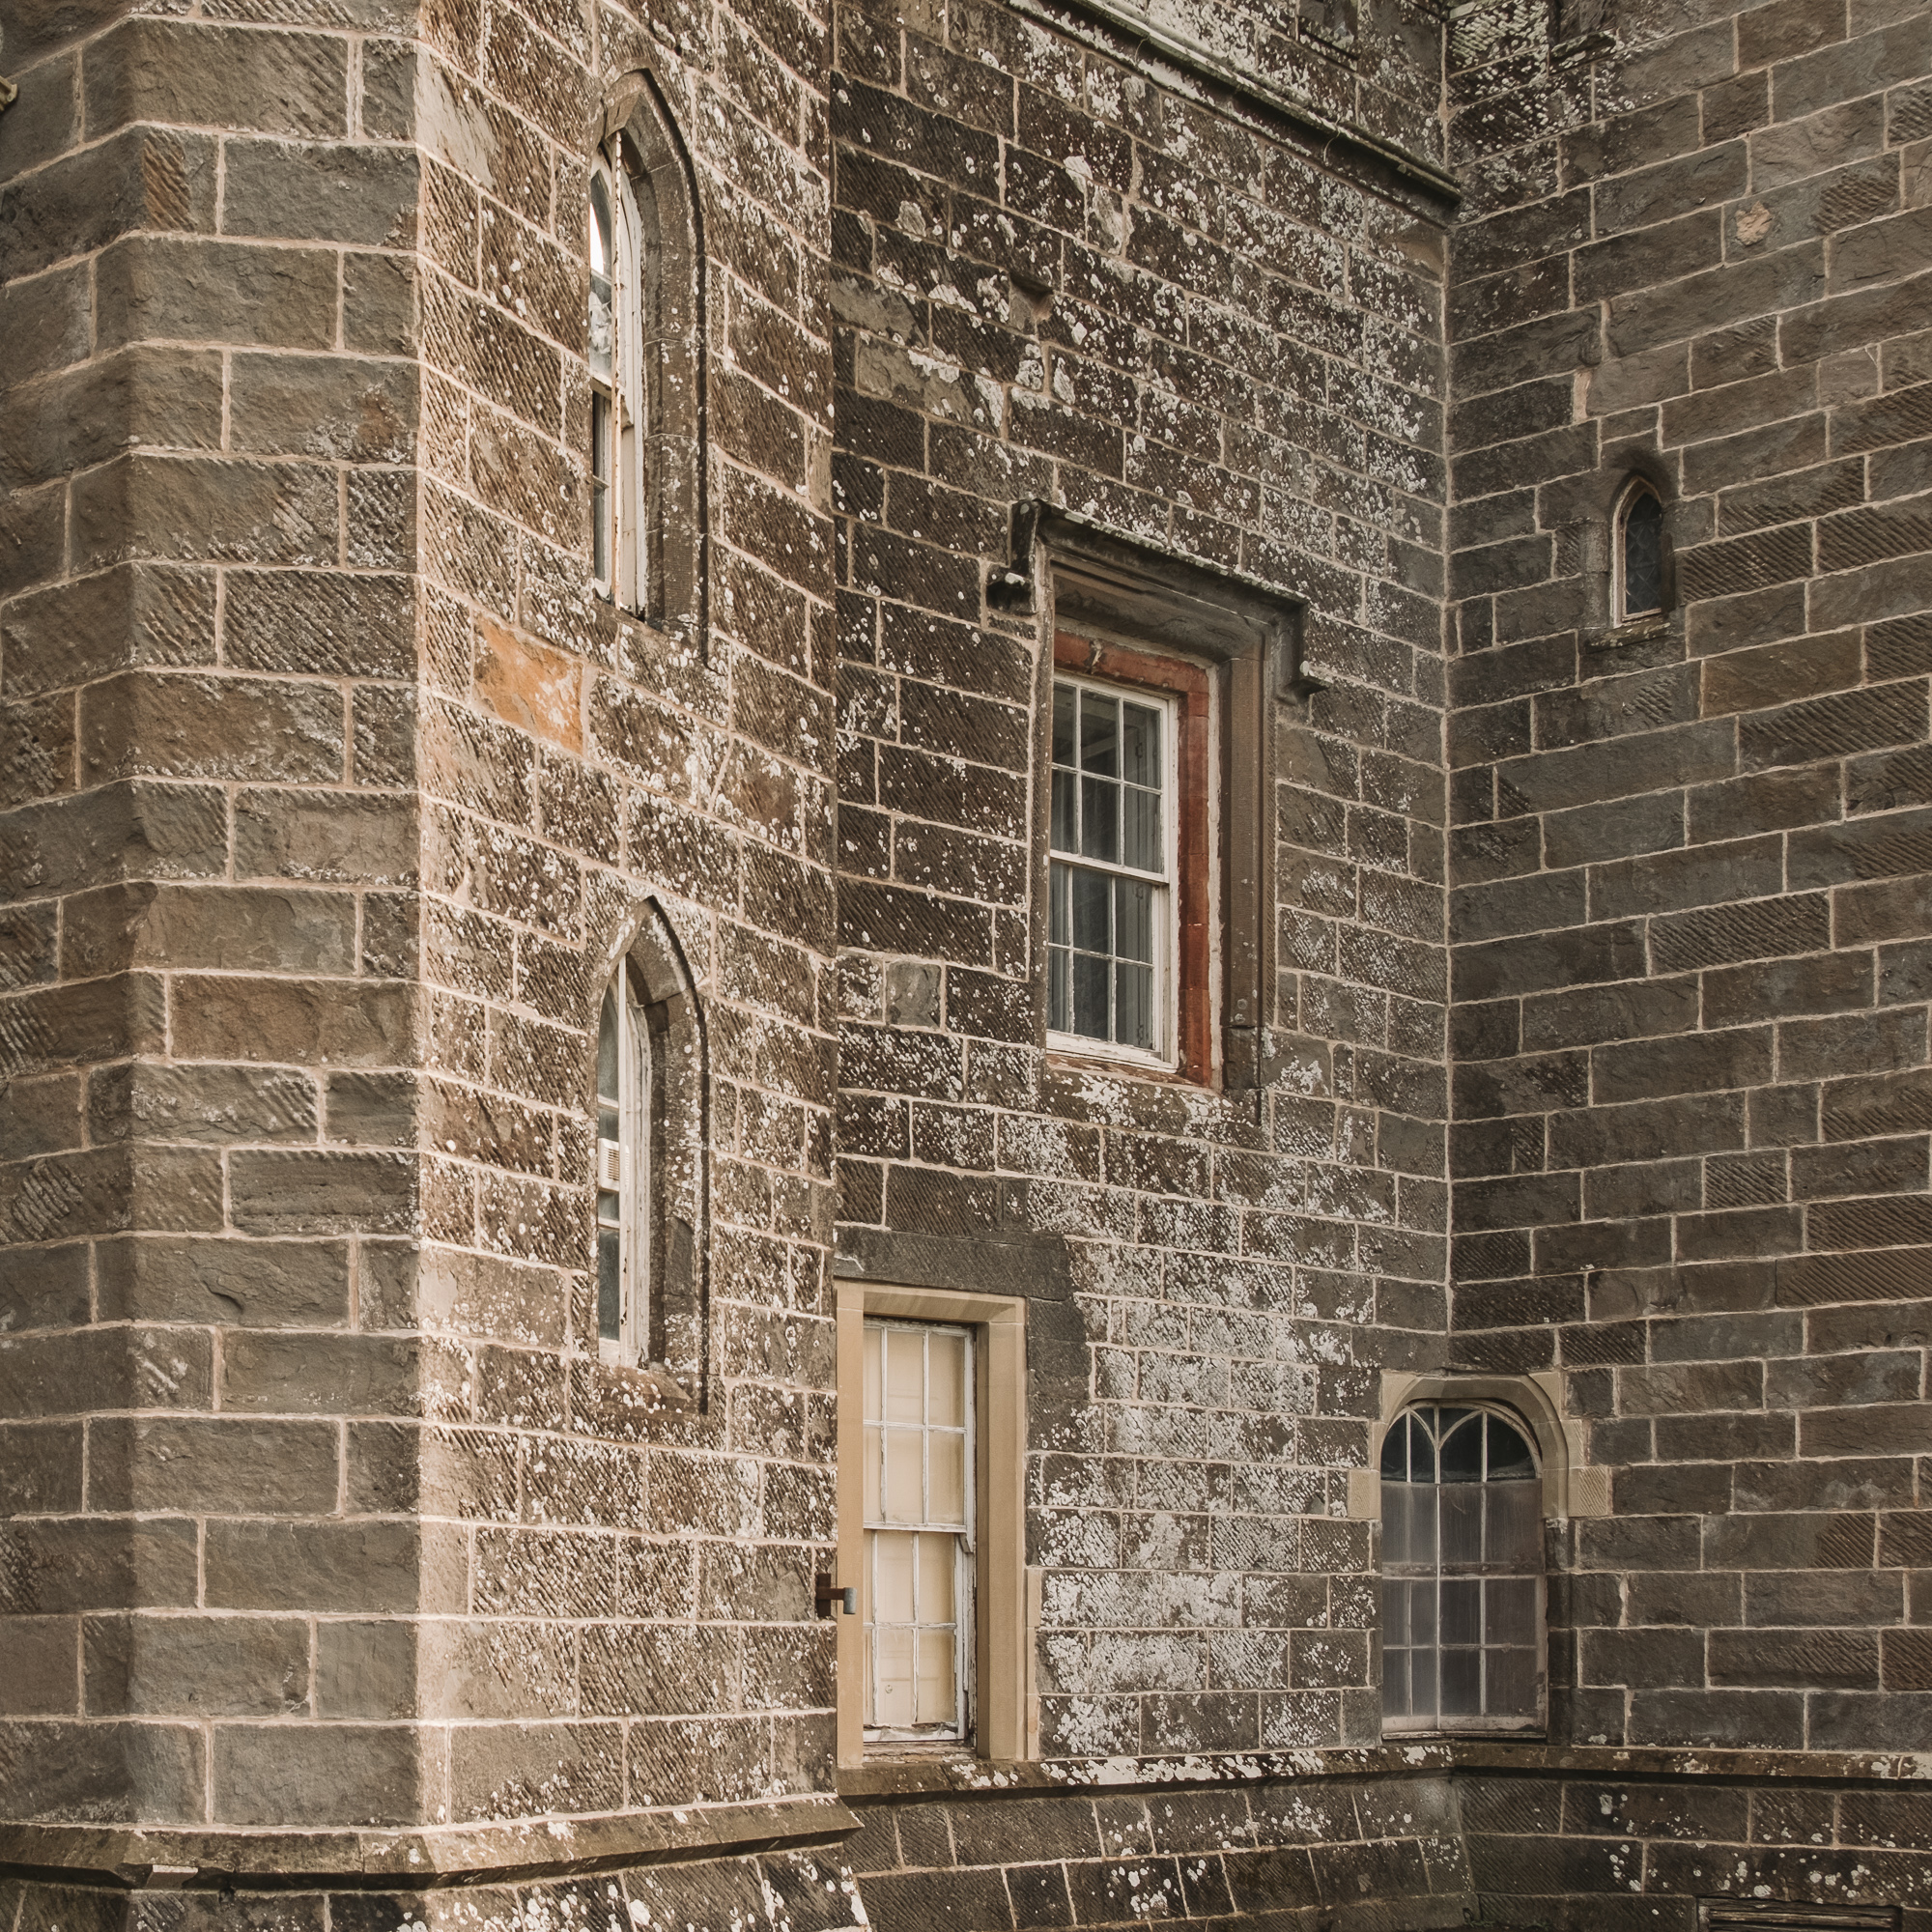 The odd arrangement of the odd windows